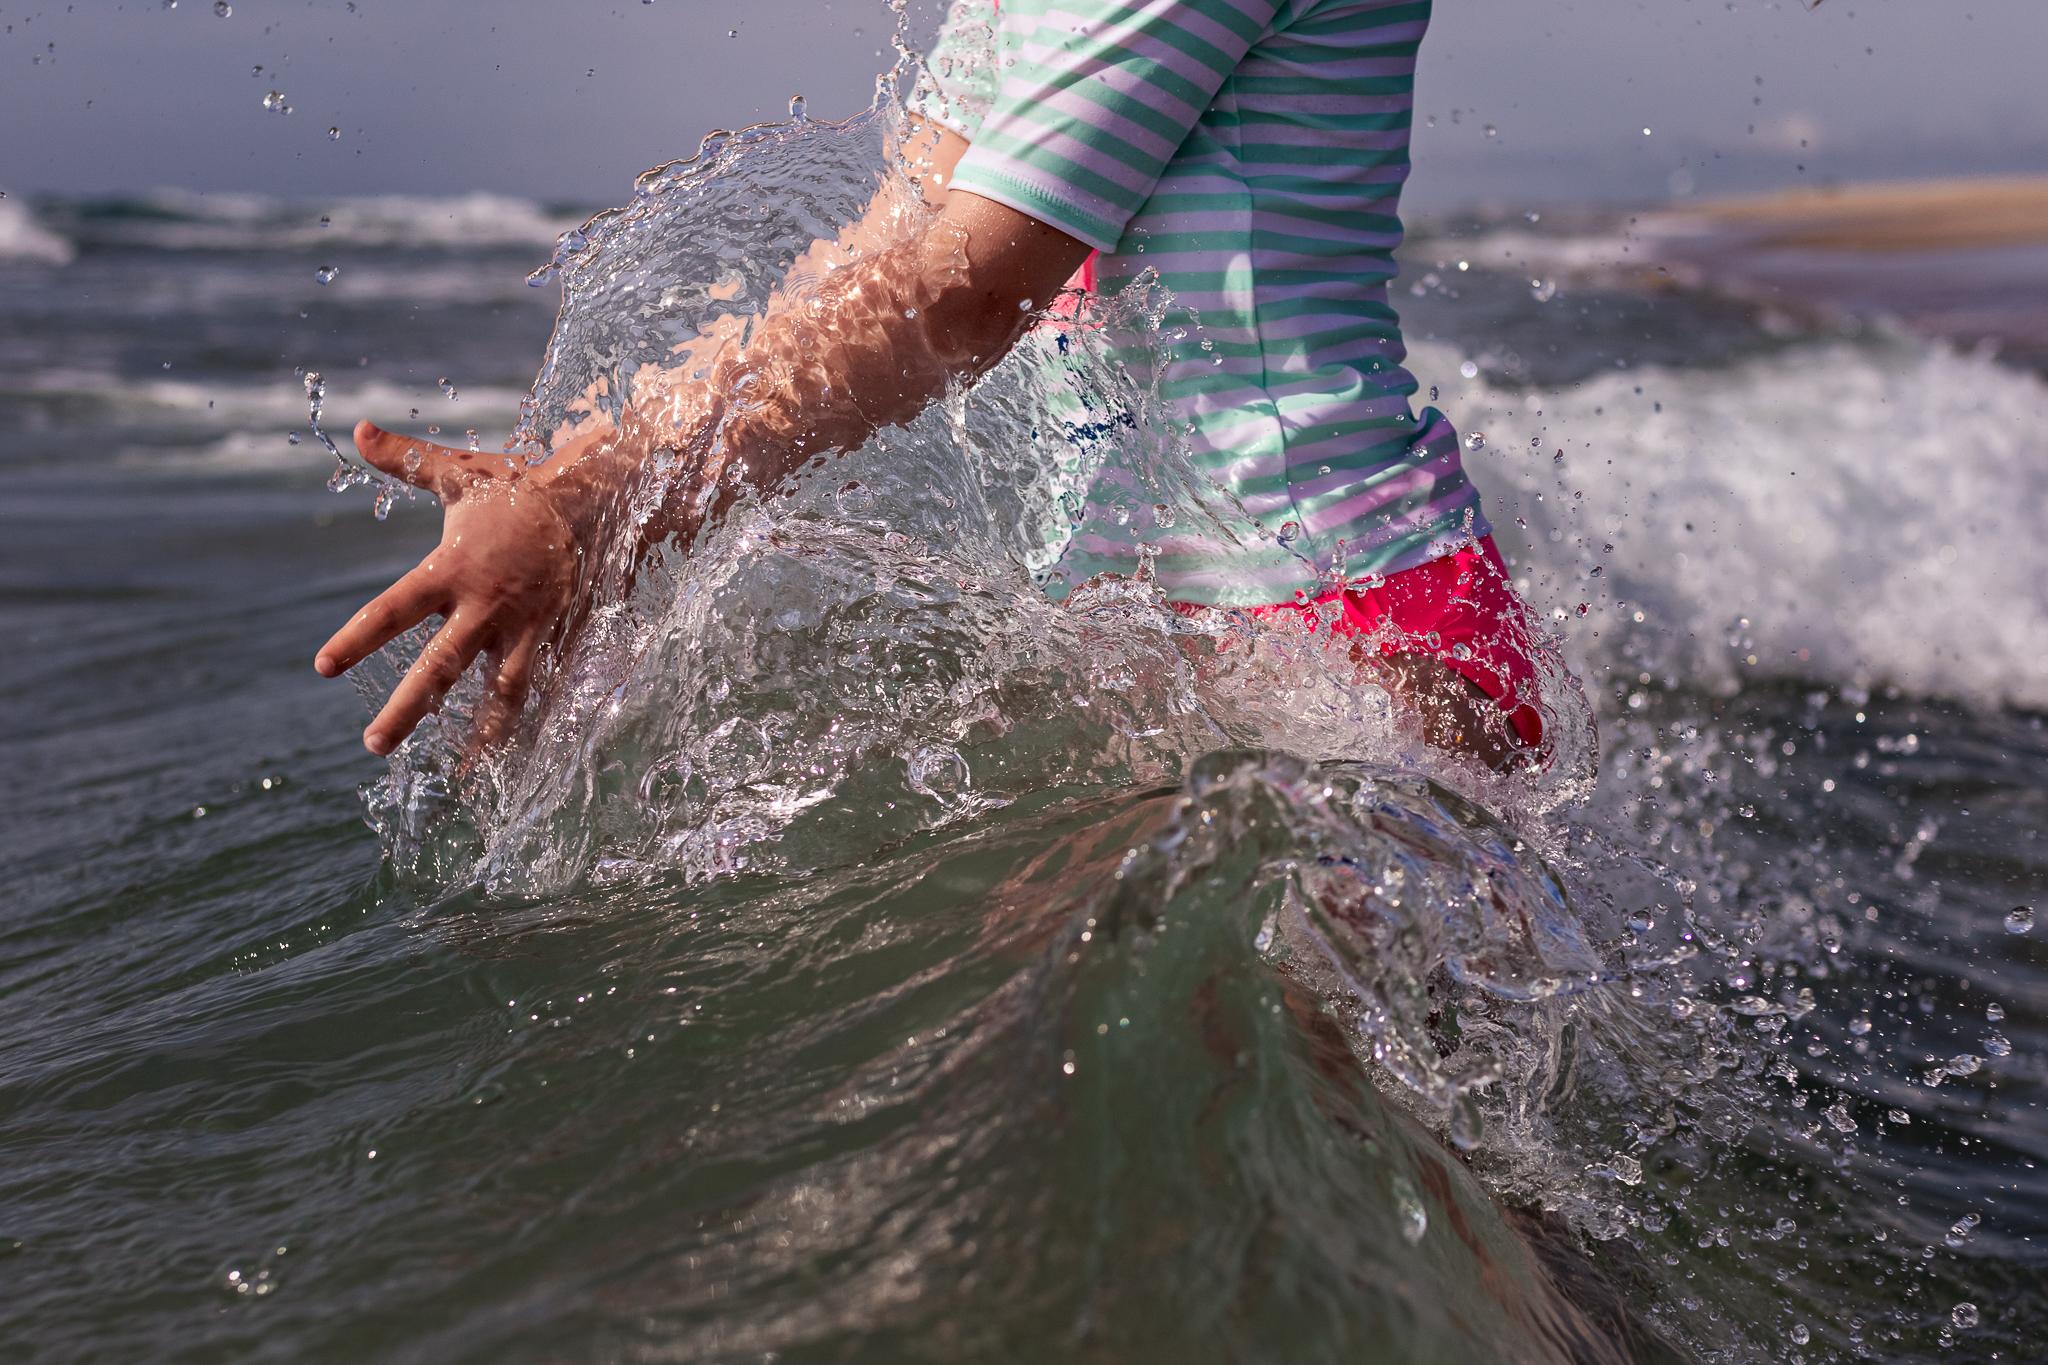 NancyElizabethPhotography, South Jersey Photographer, Hands Splashing in Ocean